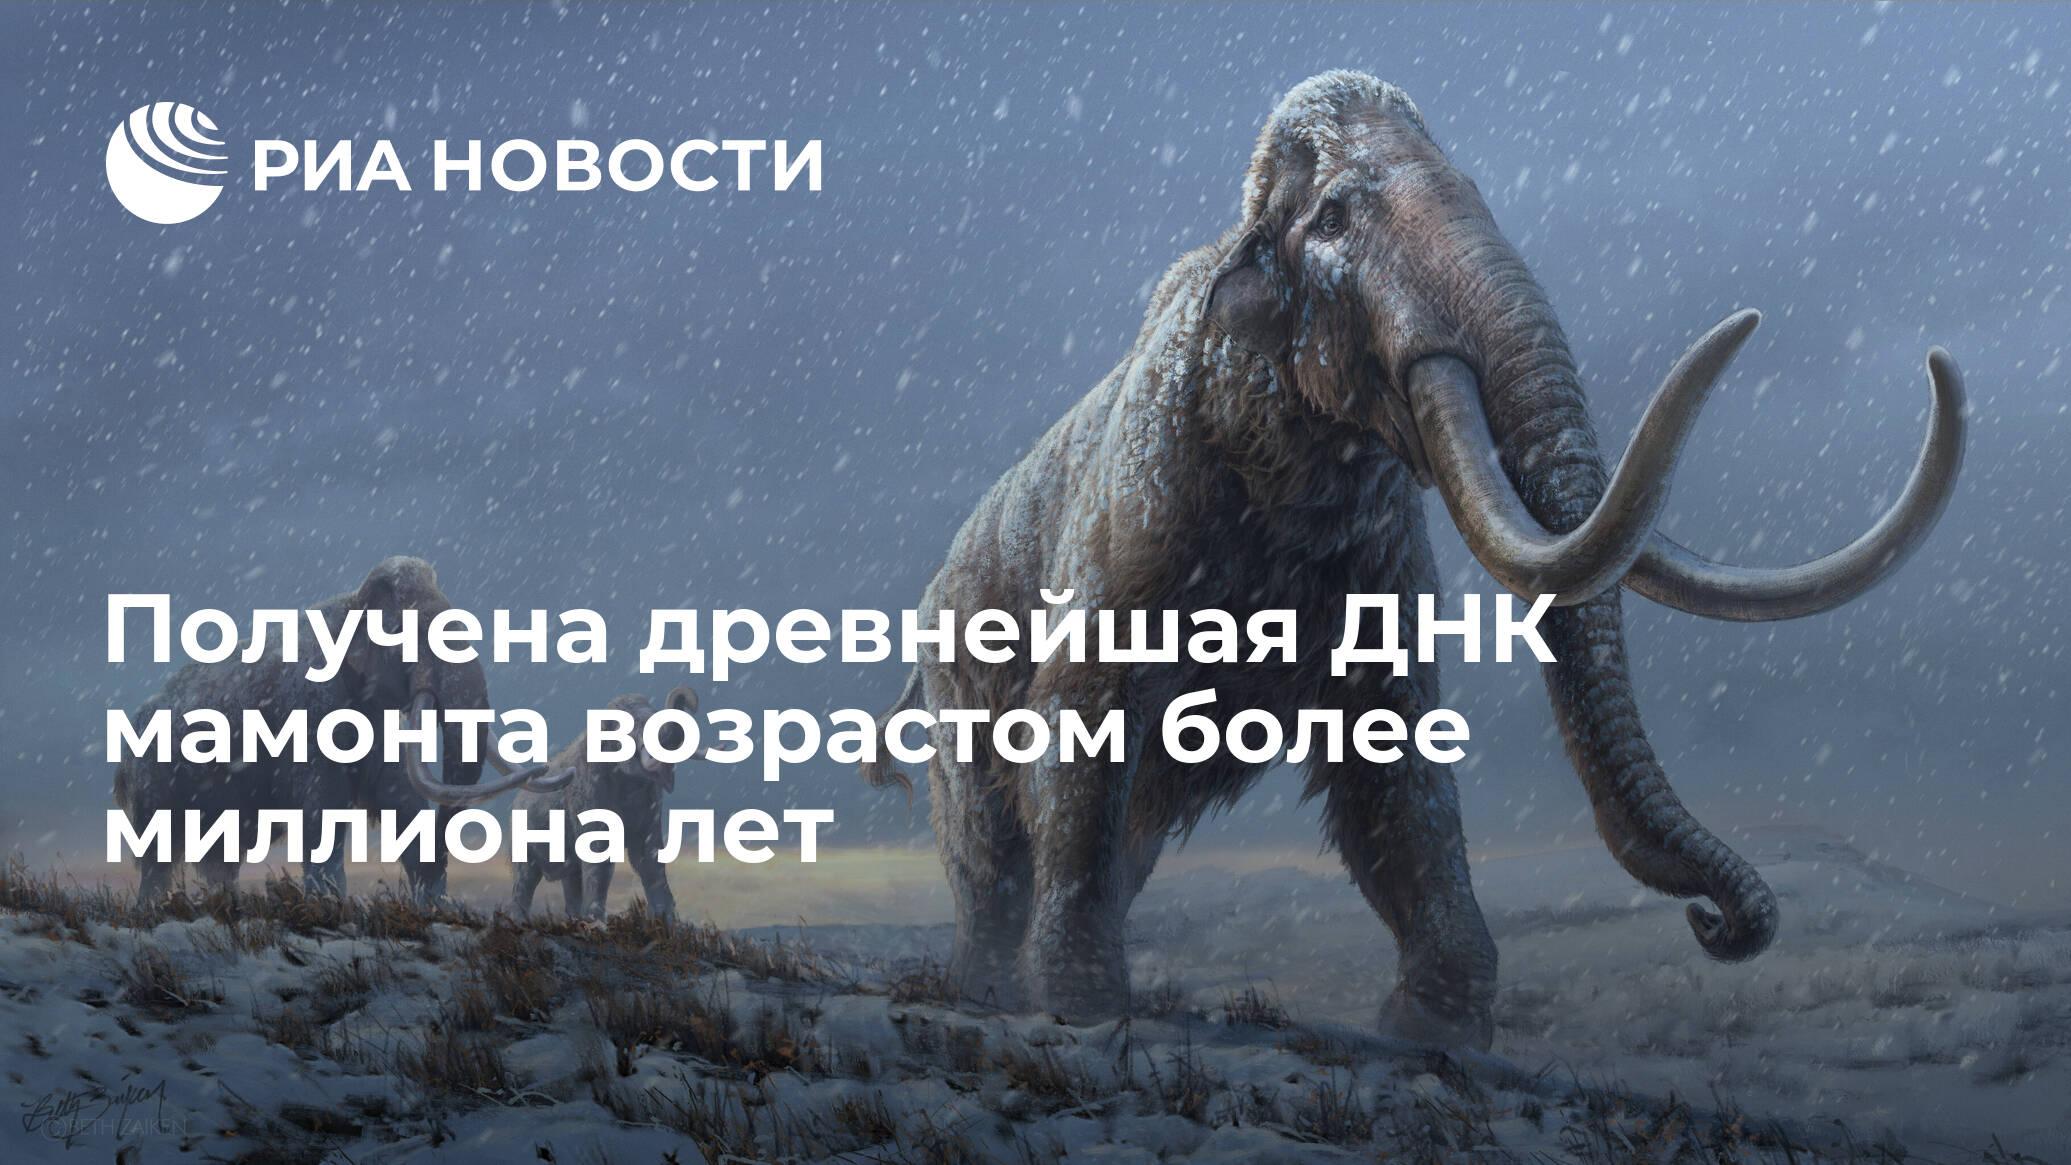 https://cdn25.img.ria.ru/images/sharing/article/1597883090.jpg?15978598811613577601